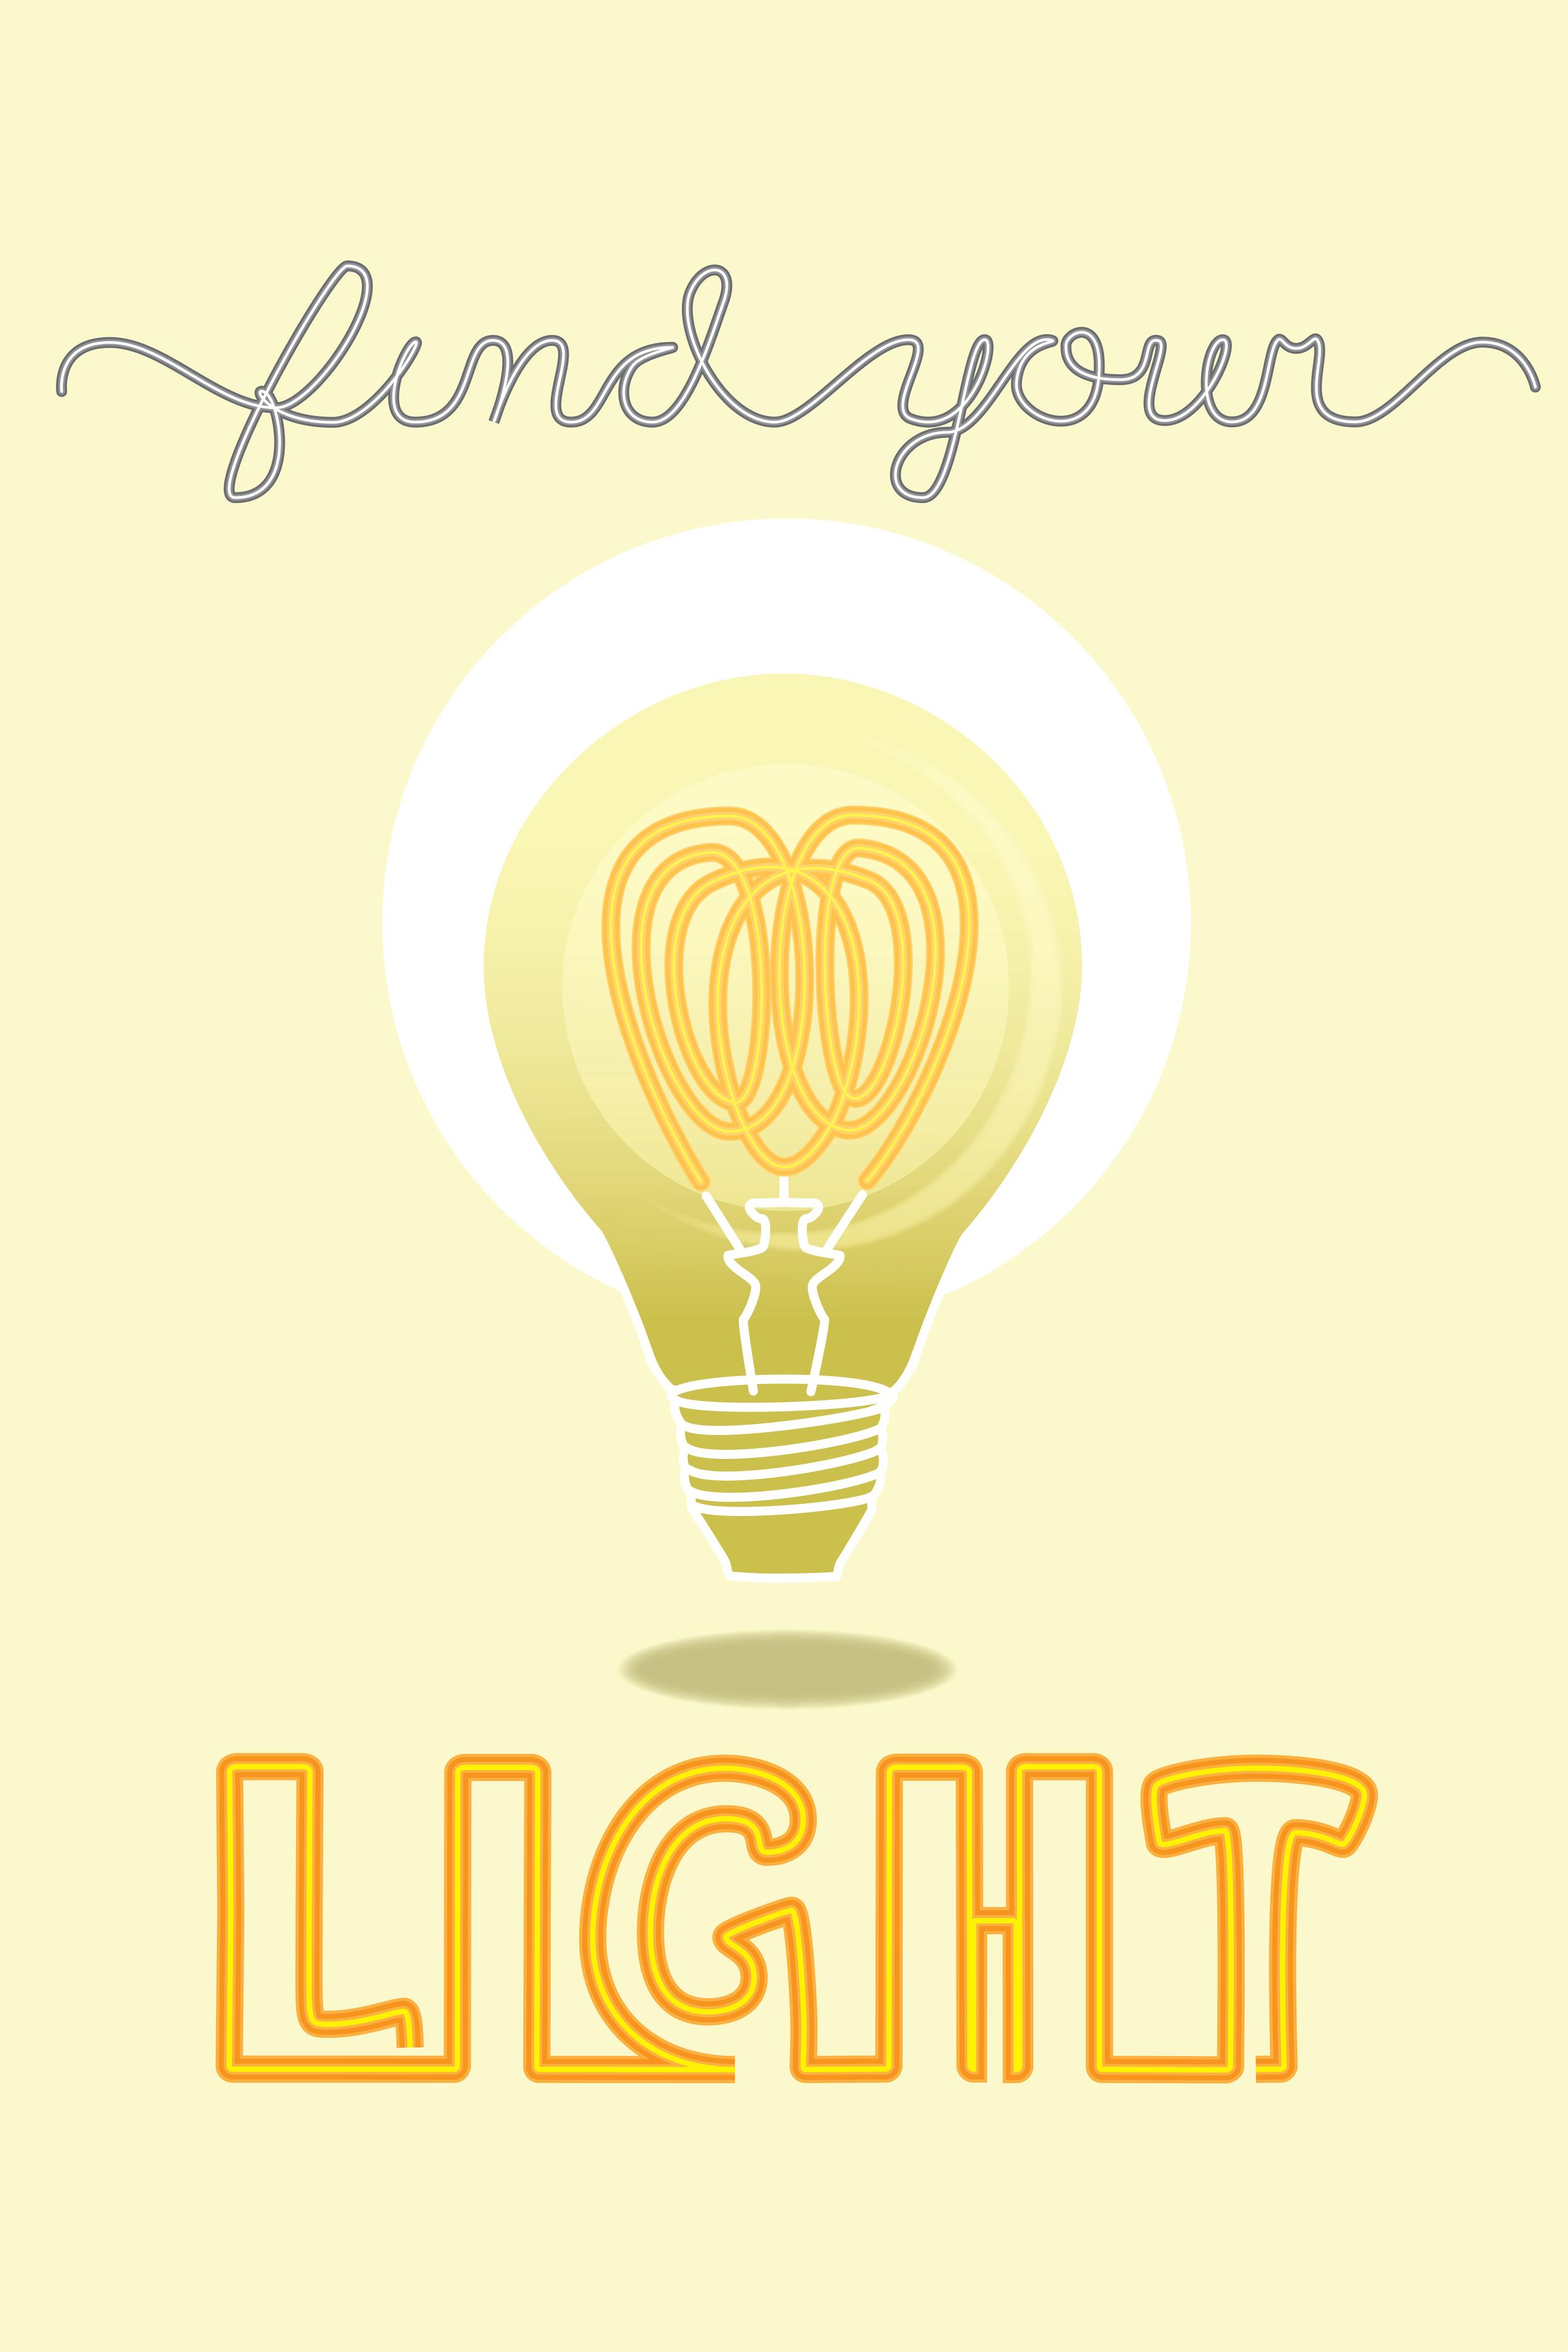 findyourlight.jpg